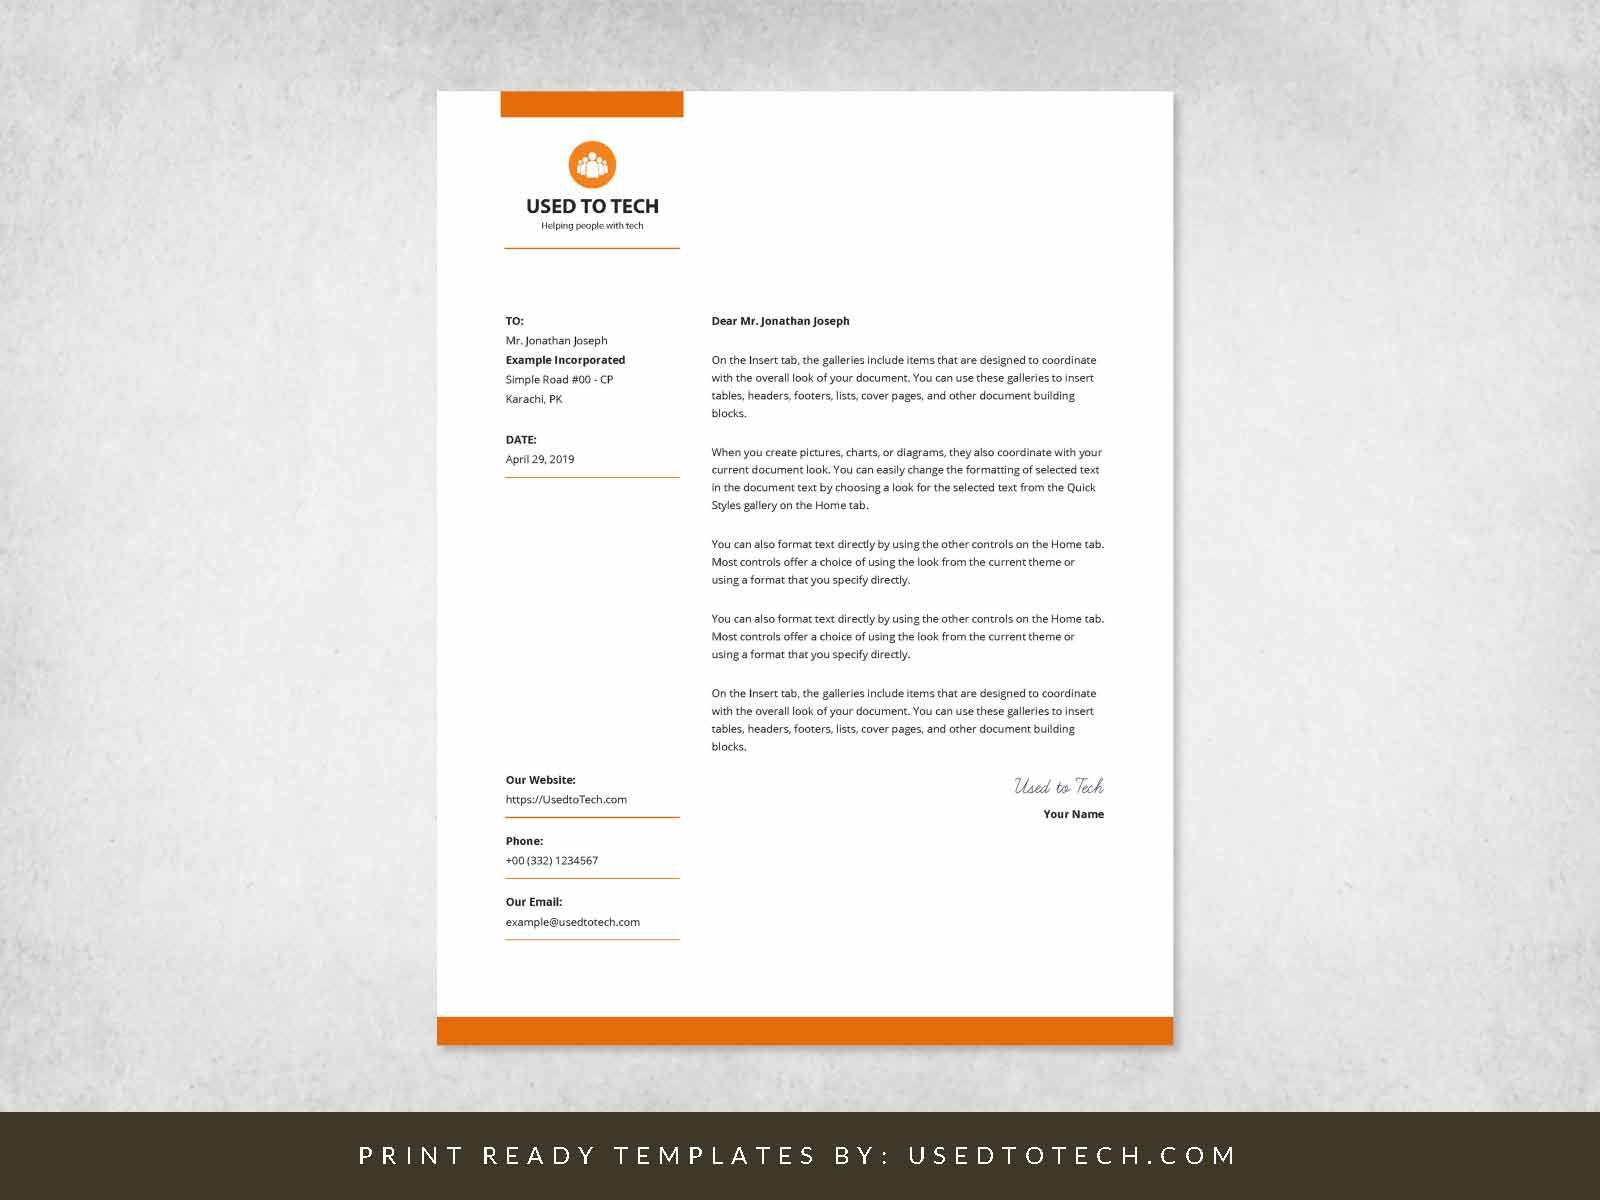 000 Wonderful Company Letterhead Template Word Idea  Busines 2007 Free DownloadFull